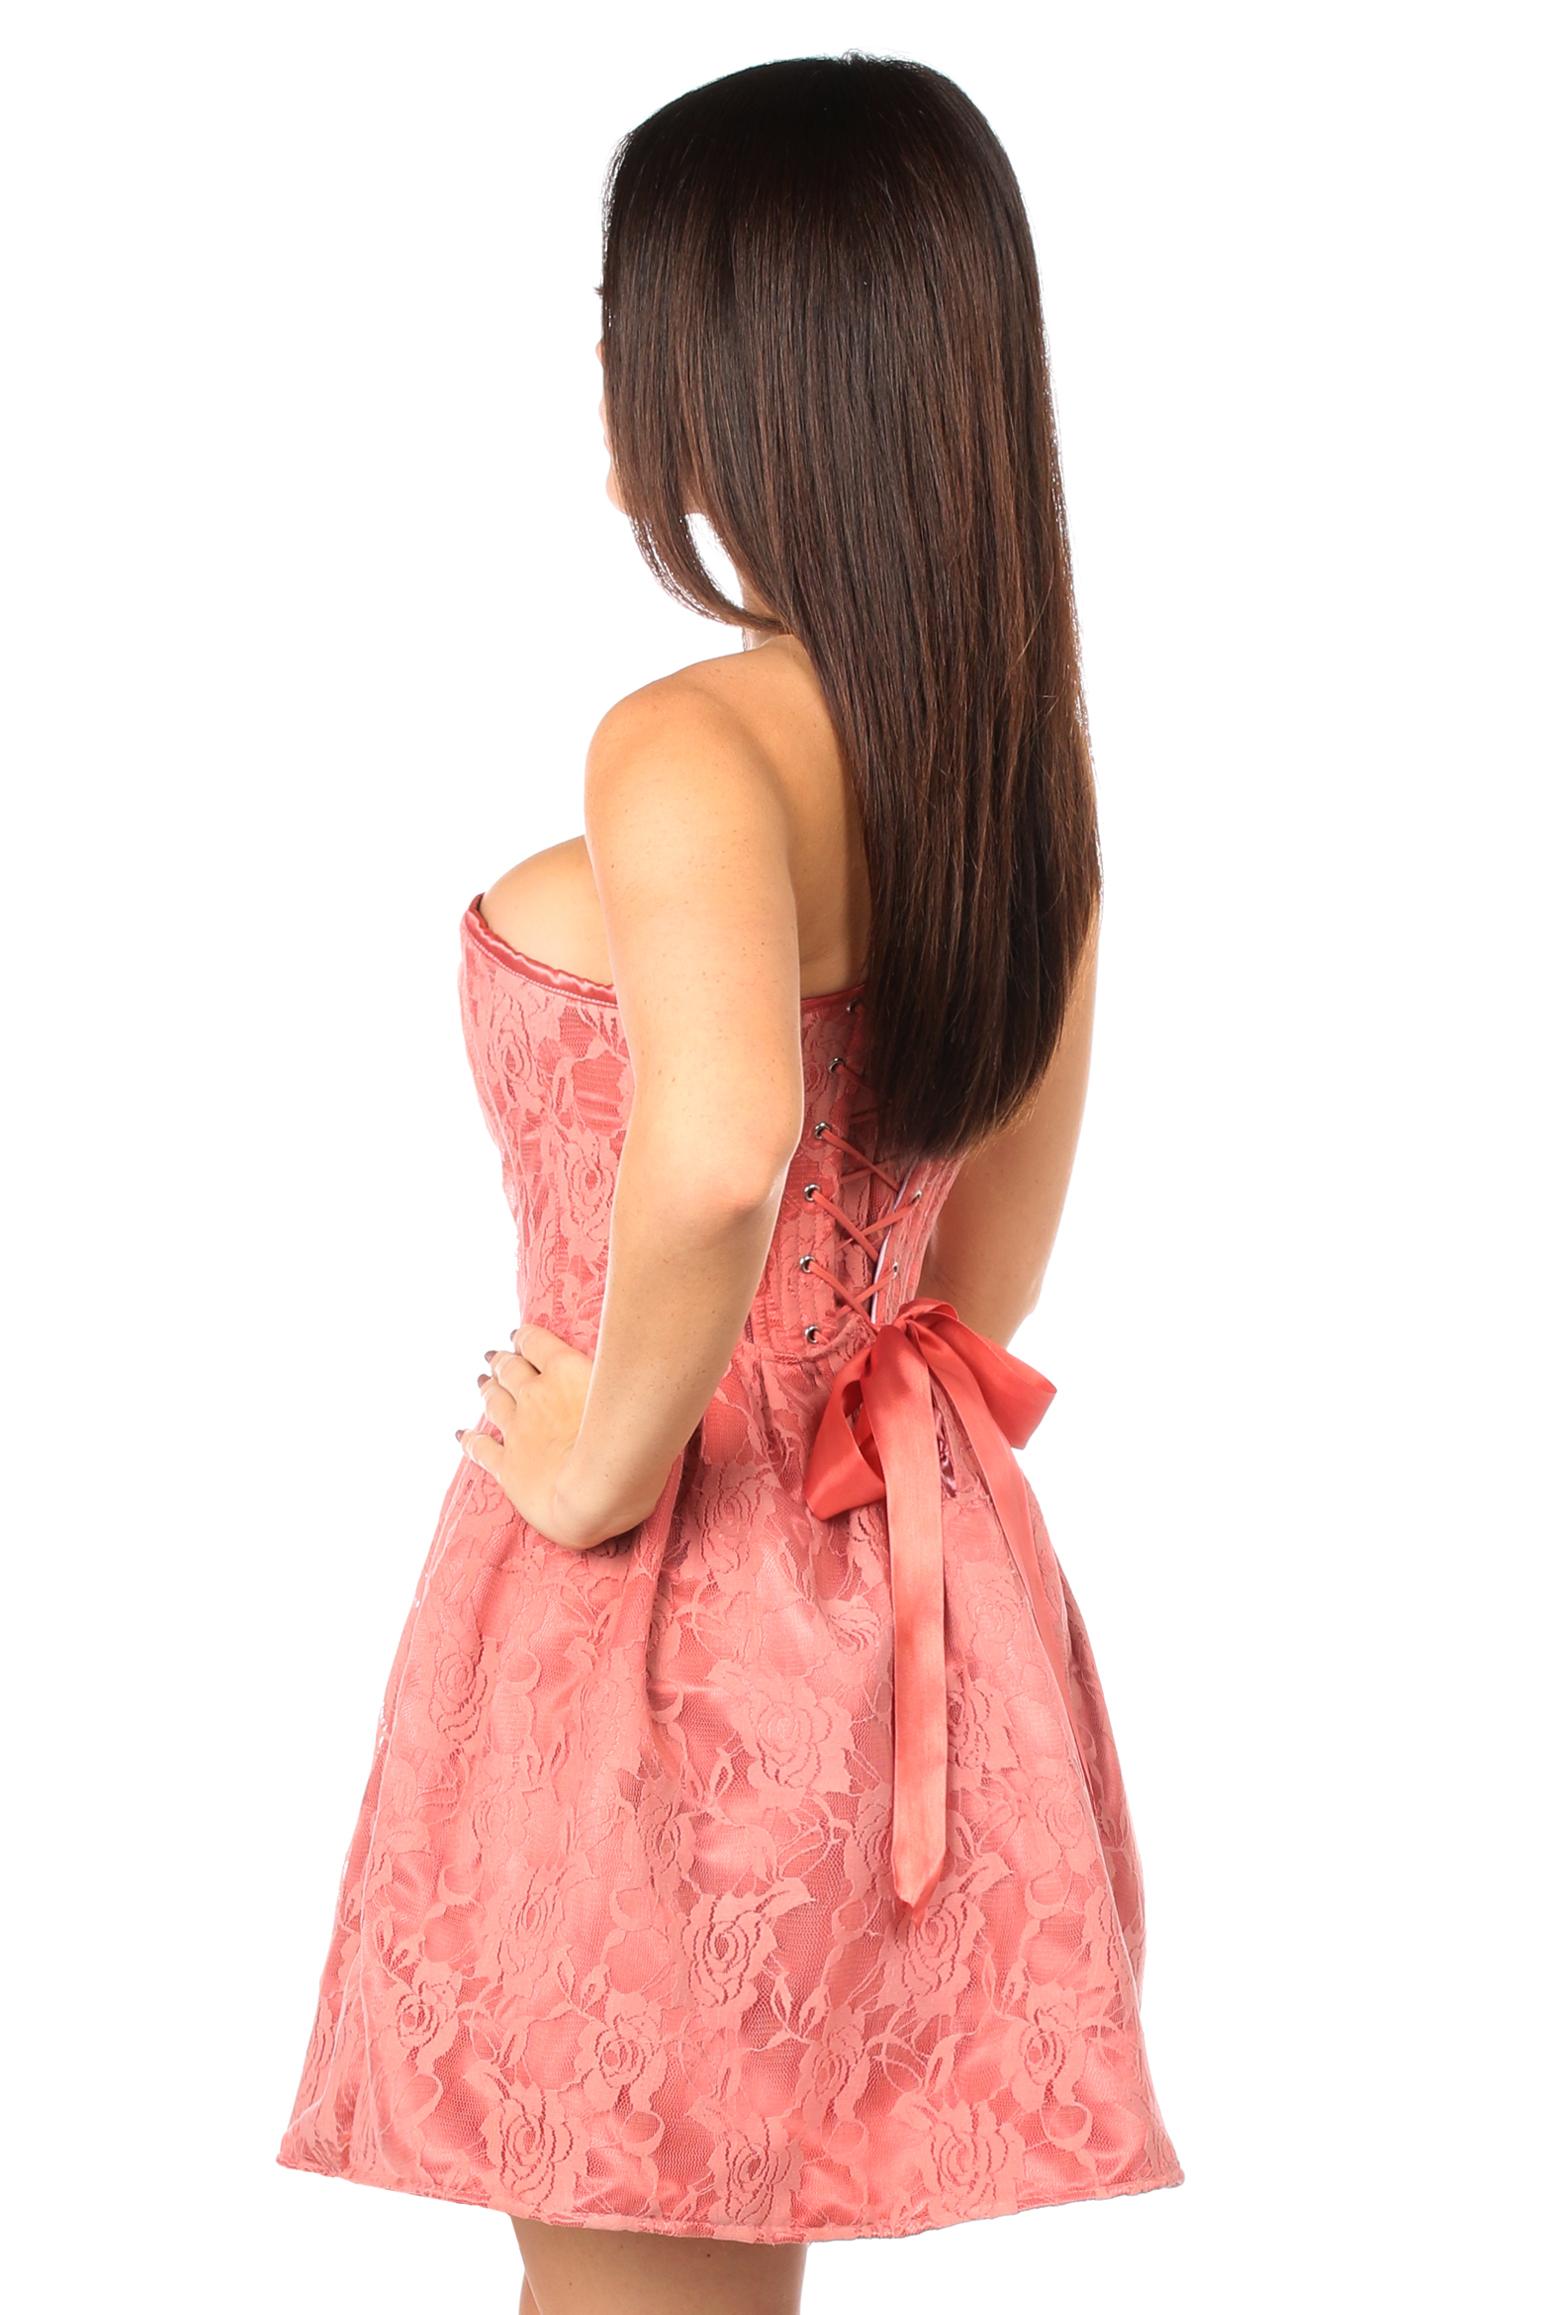 Top Drawer Steel Boned Coral Lace Empire Waist Corset Dress DASTD-596